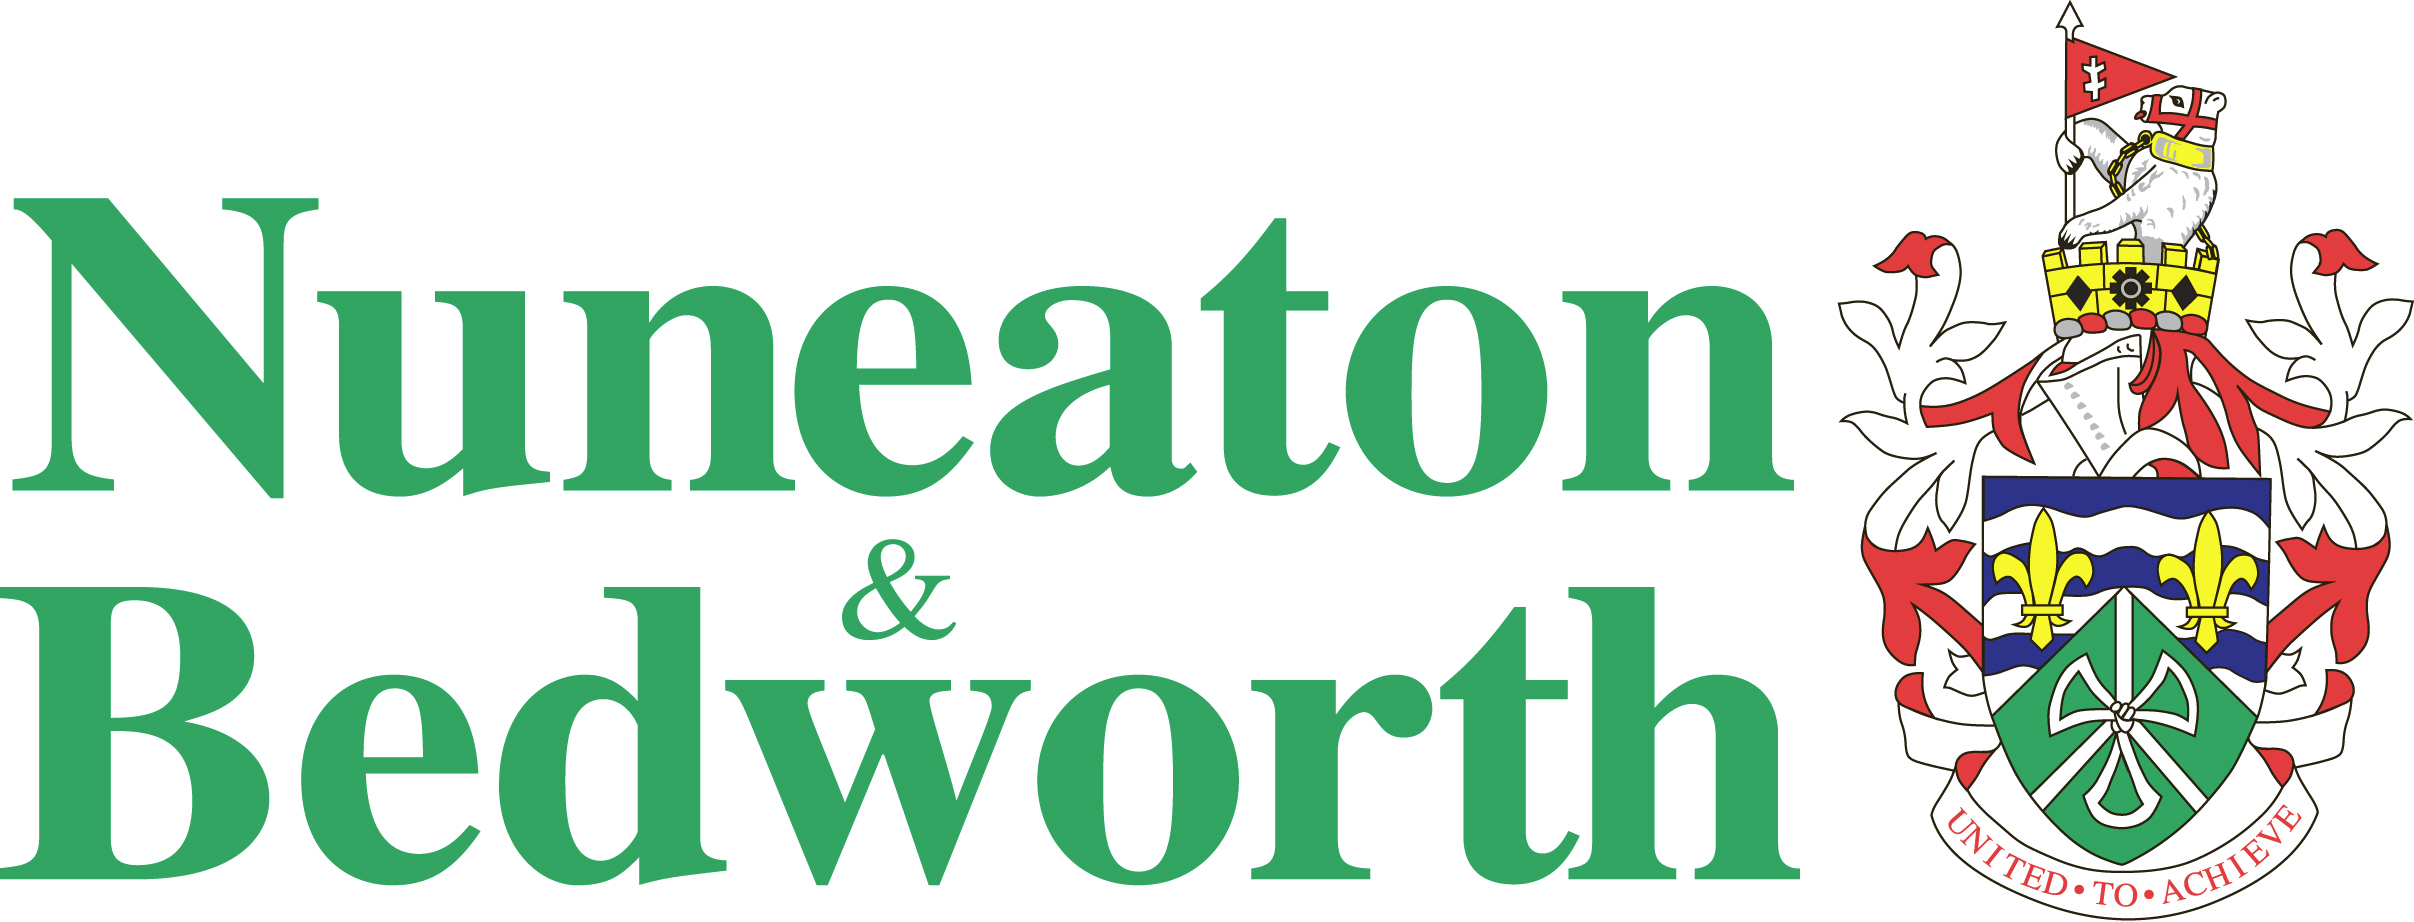 Nuneaton_and_Bedworth_Borough_Council